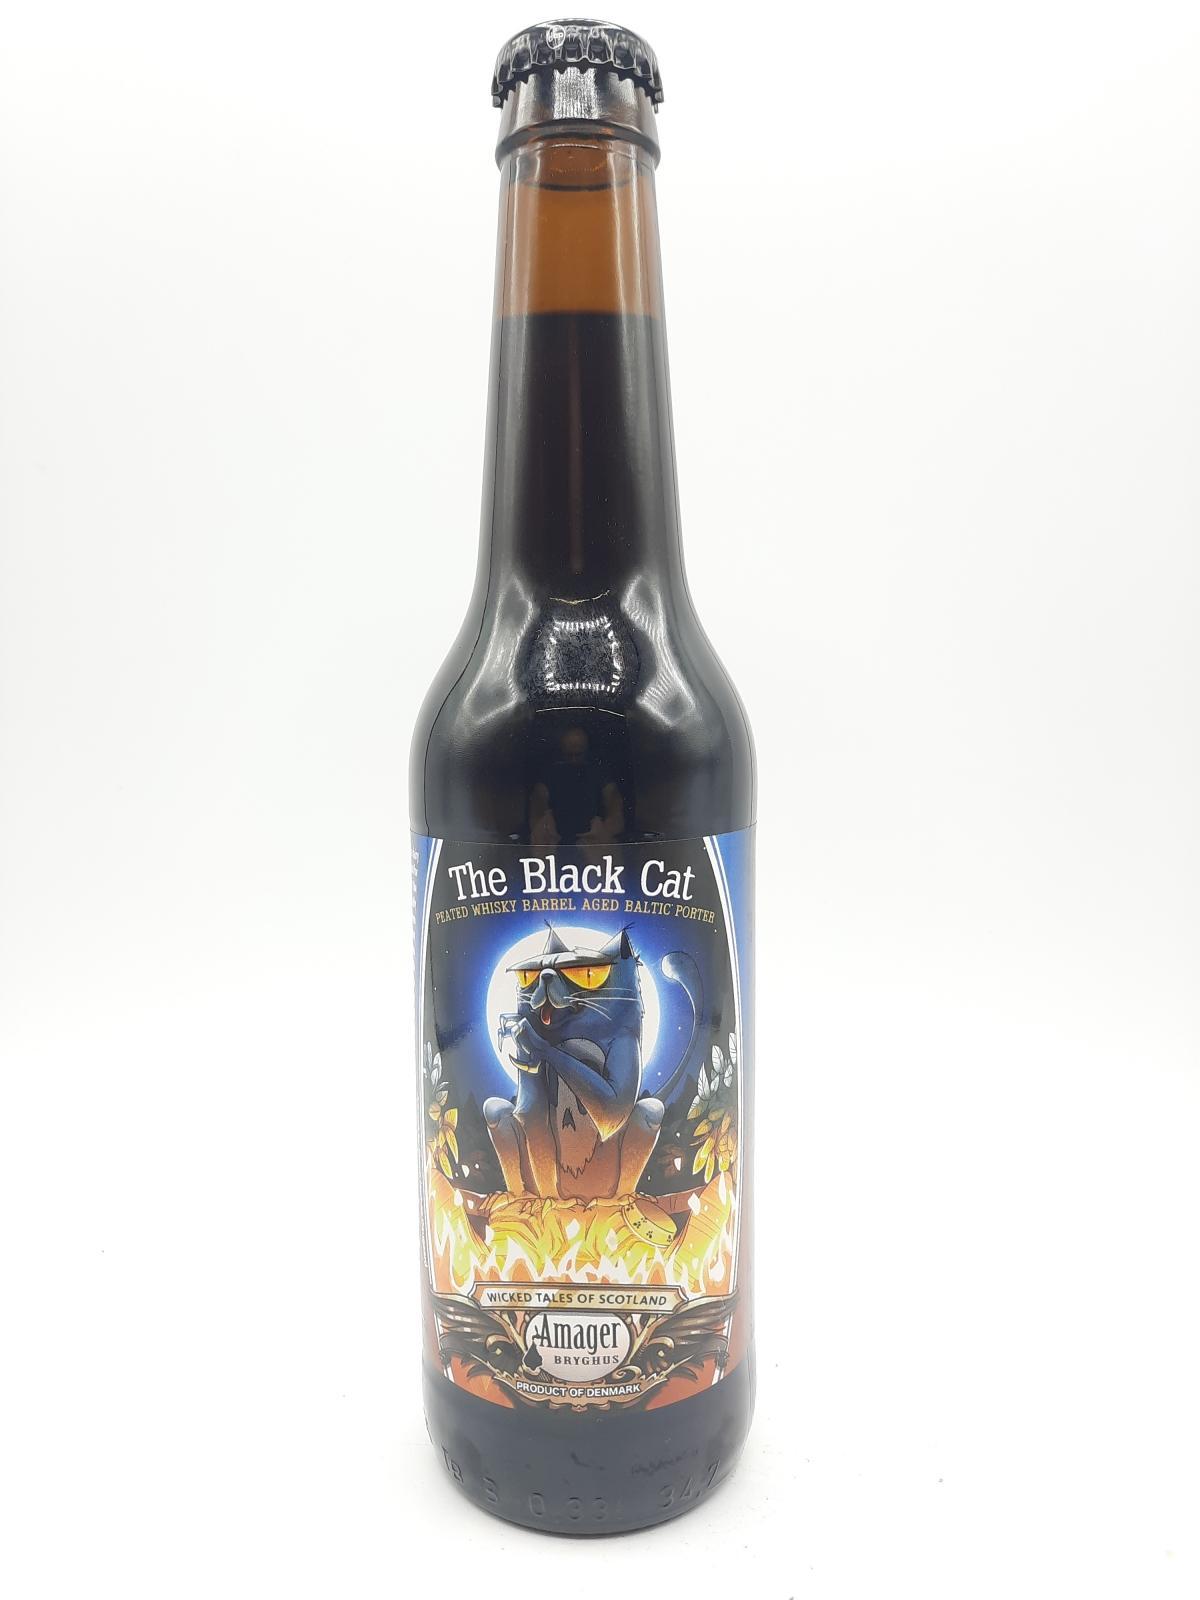 Image The Black Cat